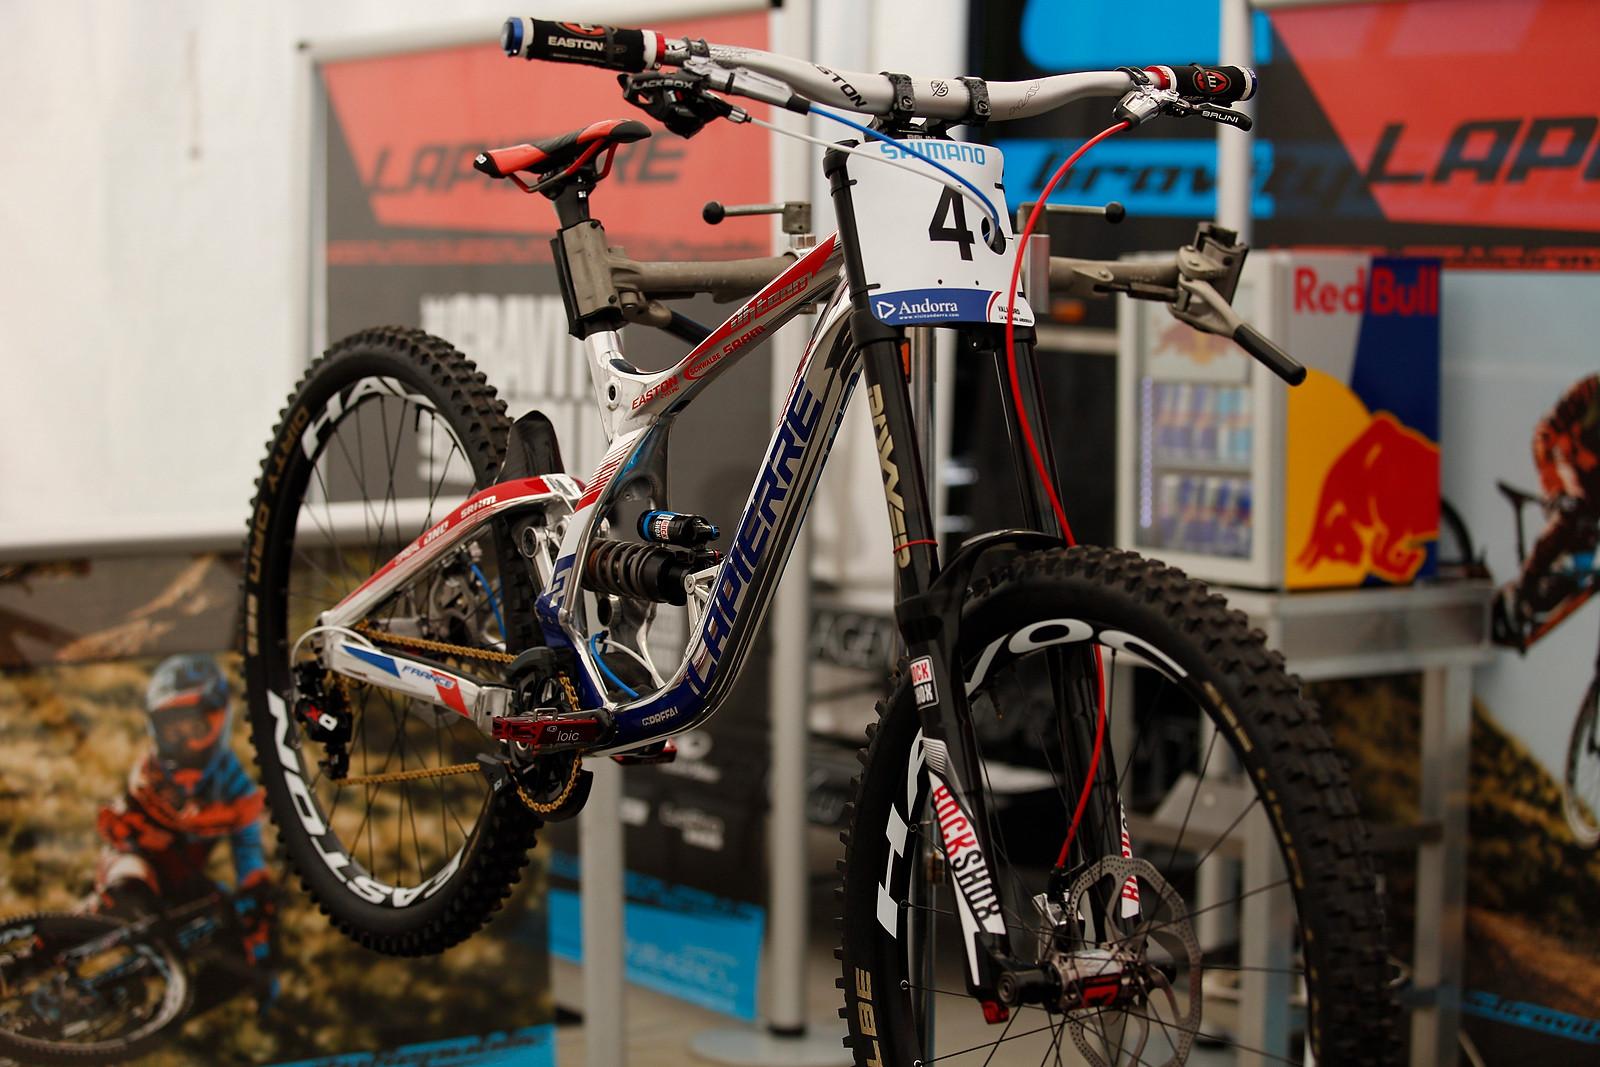 Lapierre World Champs Bikes for Loic Bruni and Loris Vergier - PIT BITS - 2015 WORLD CHAMPS - Mountain Biking Pictures - Vital MTB